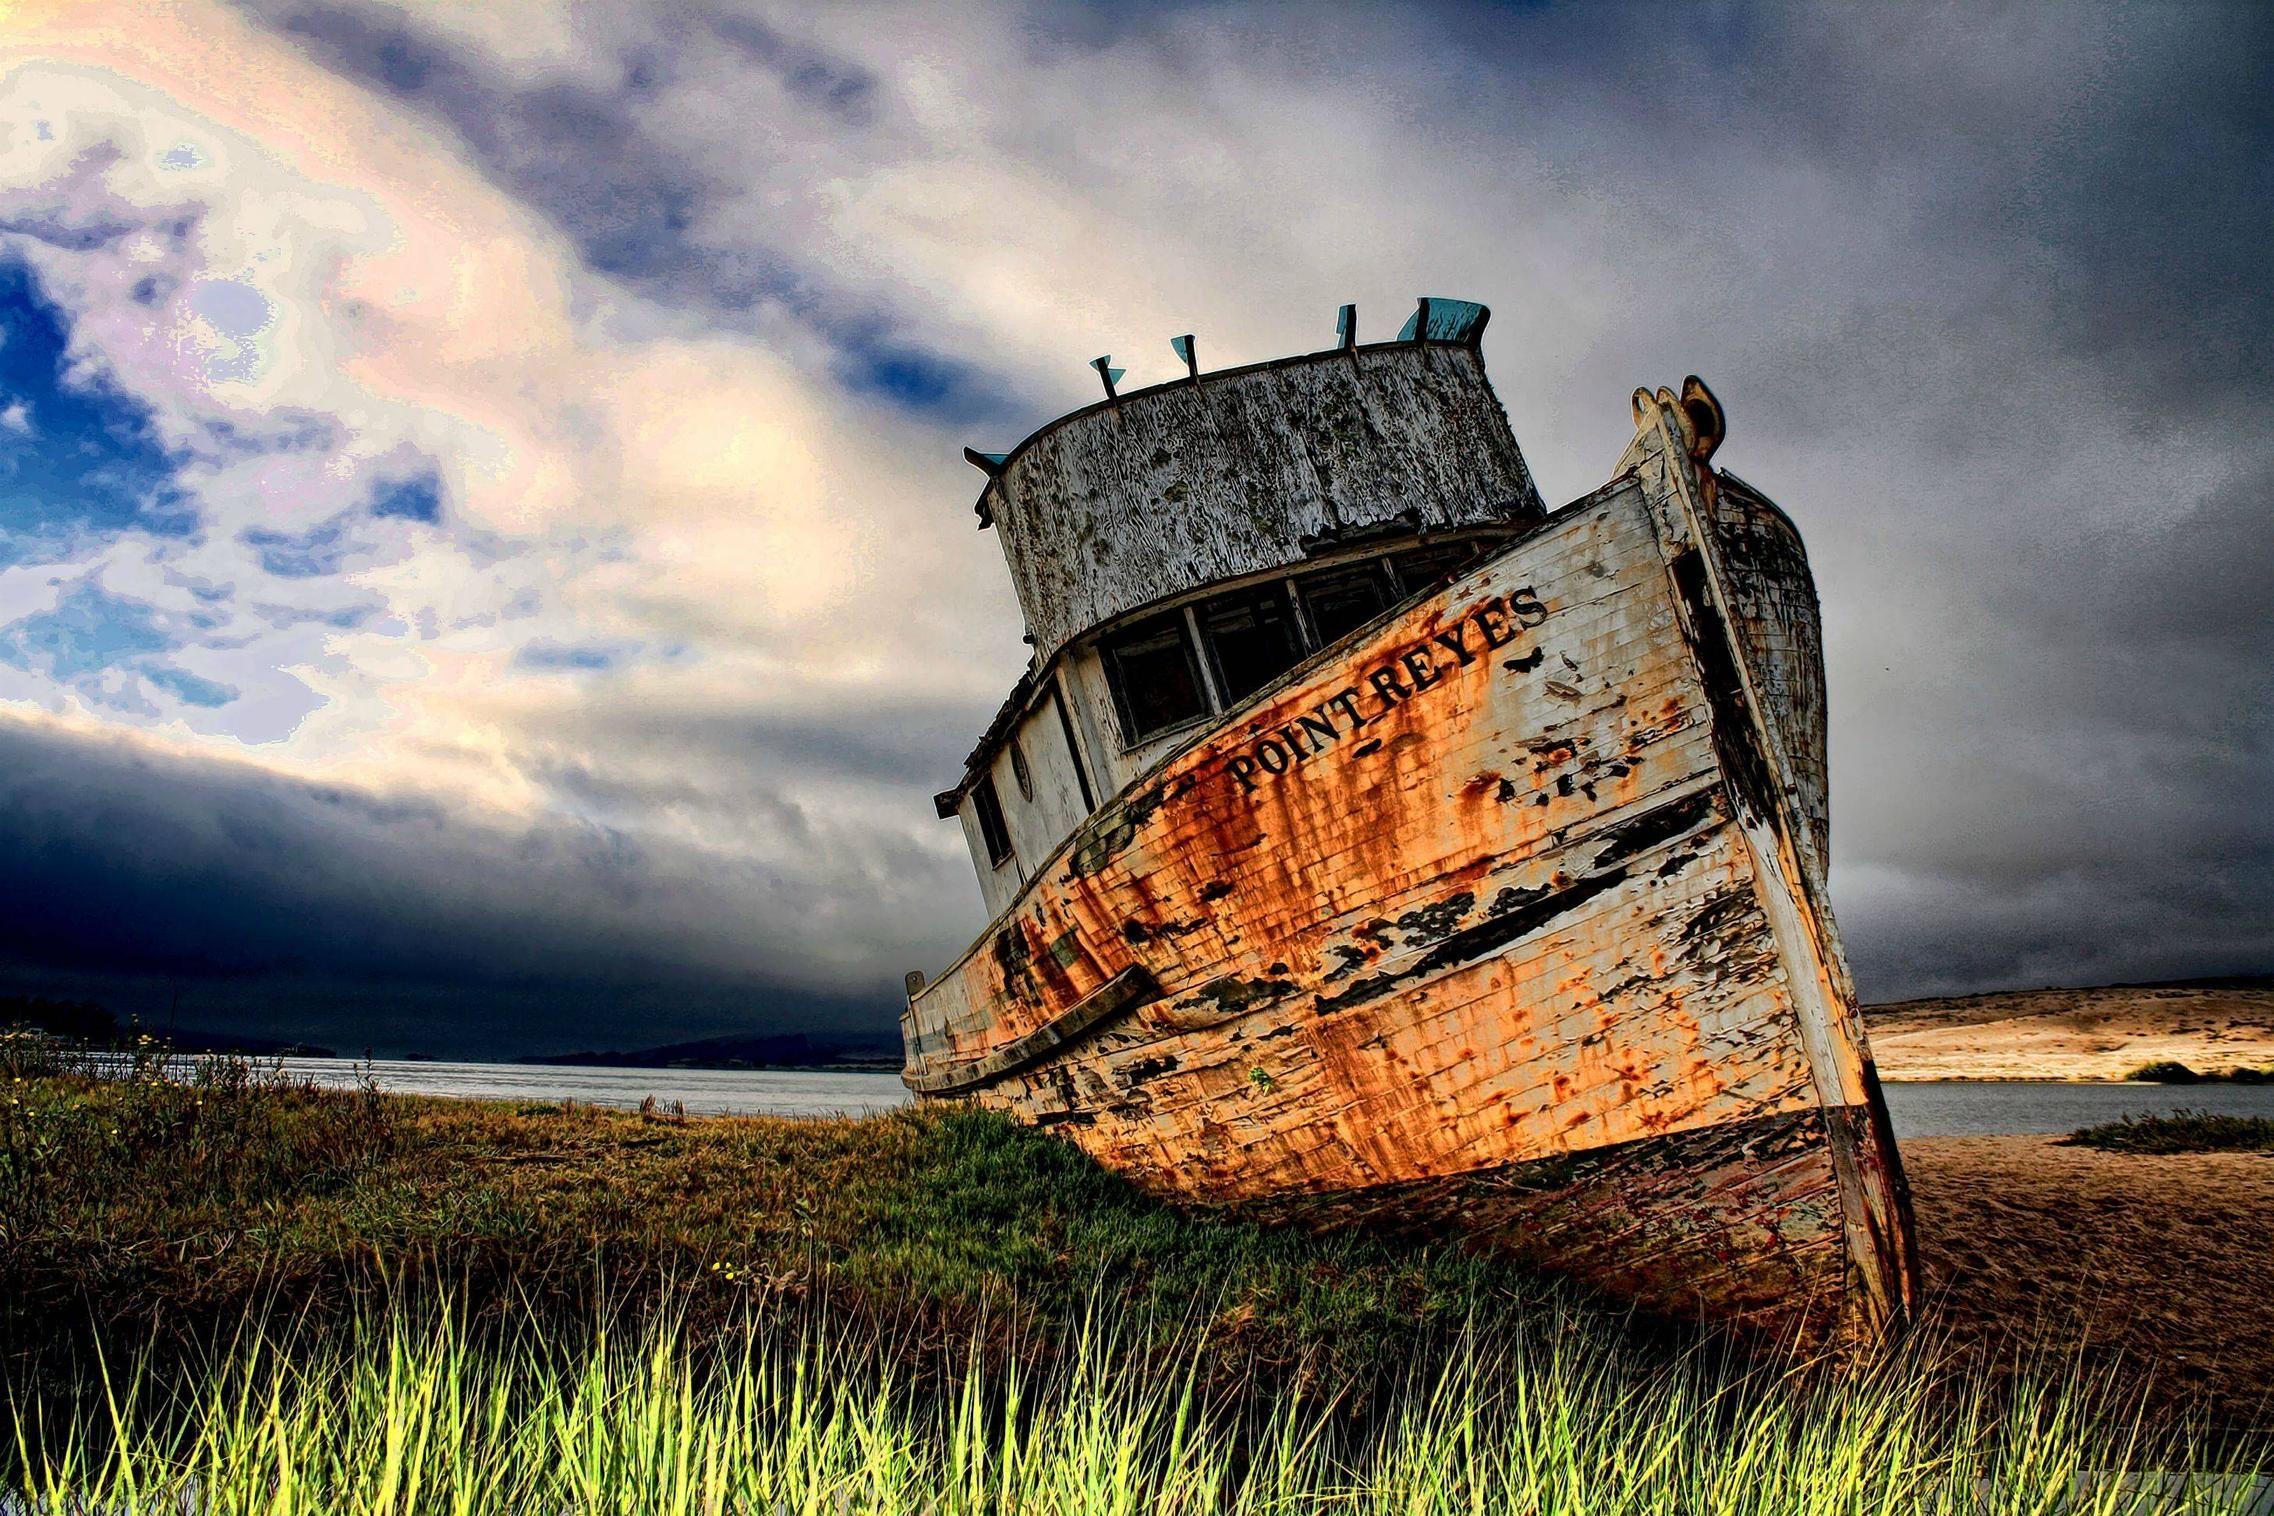 vintage #ship #grass #photography #desktop wallpaper #landscape ...